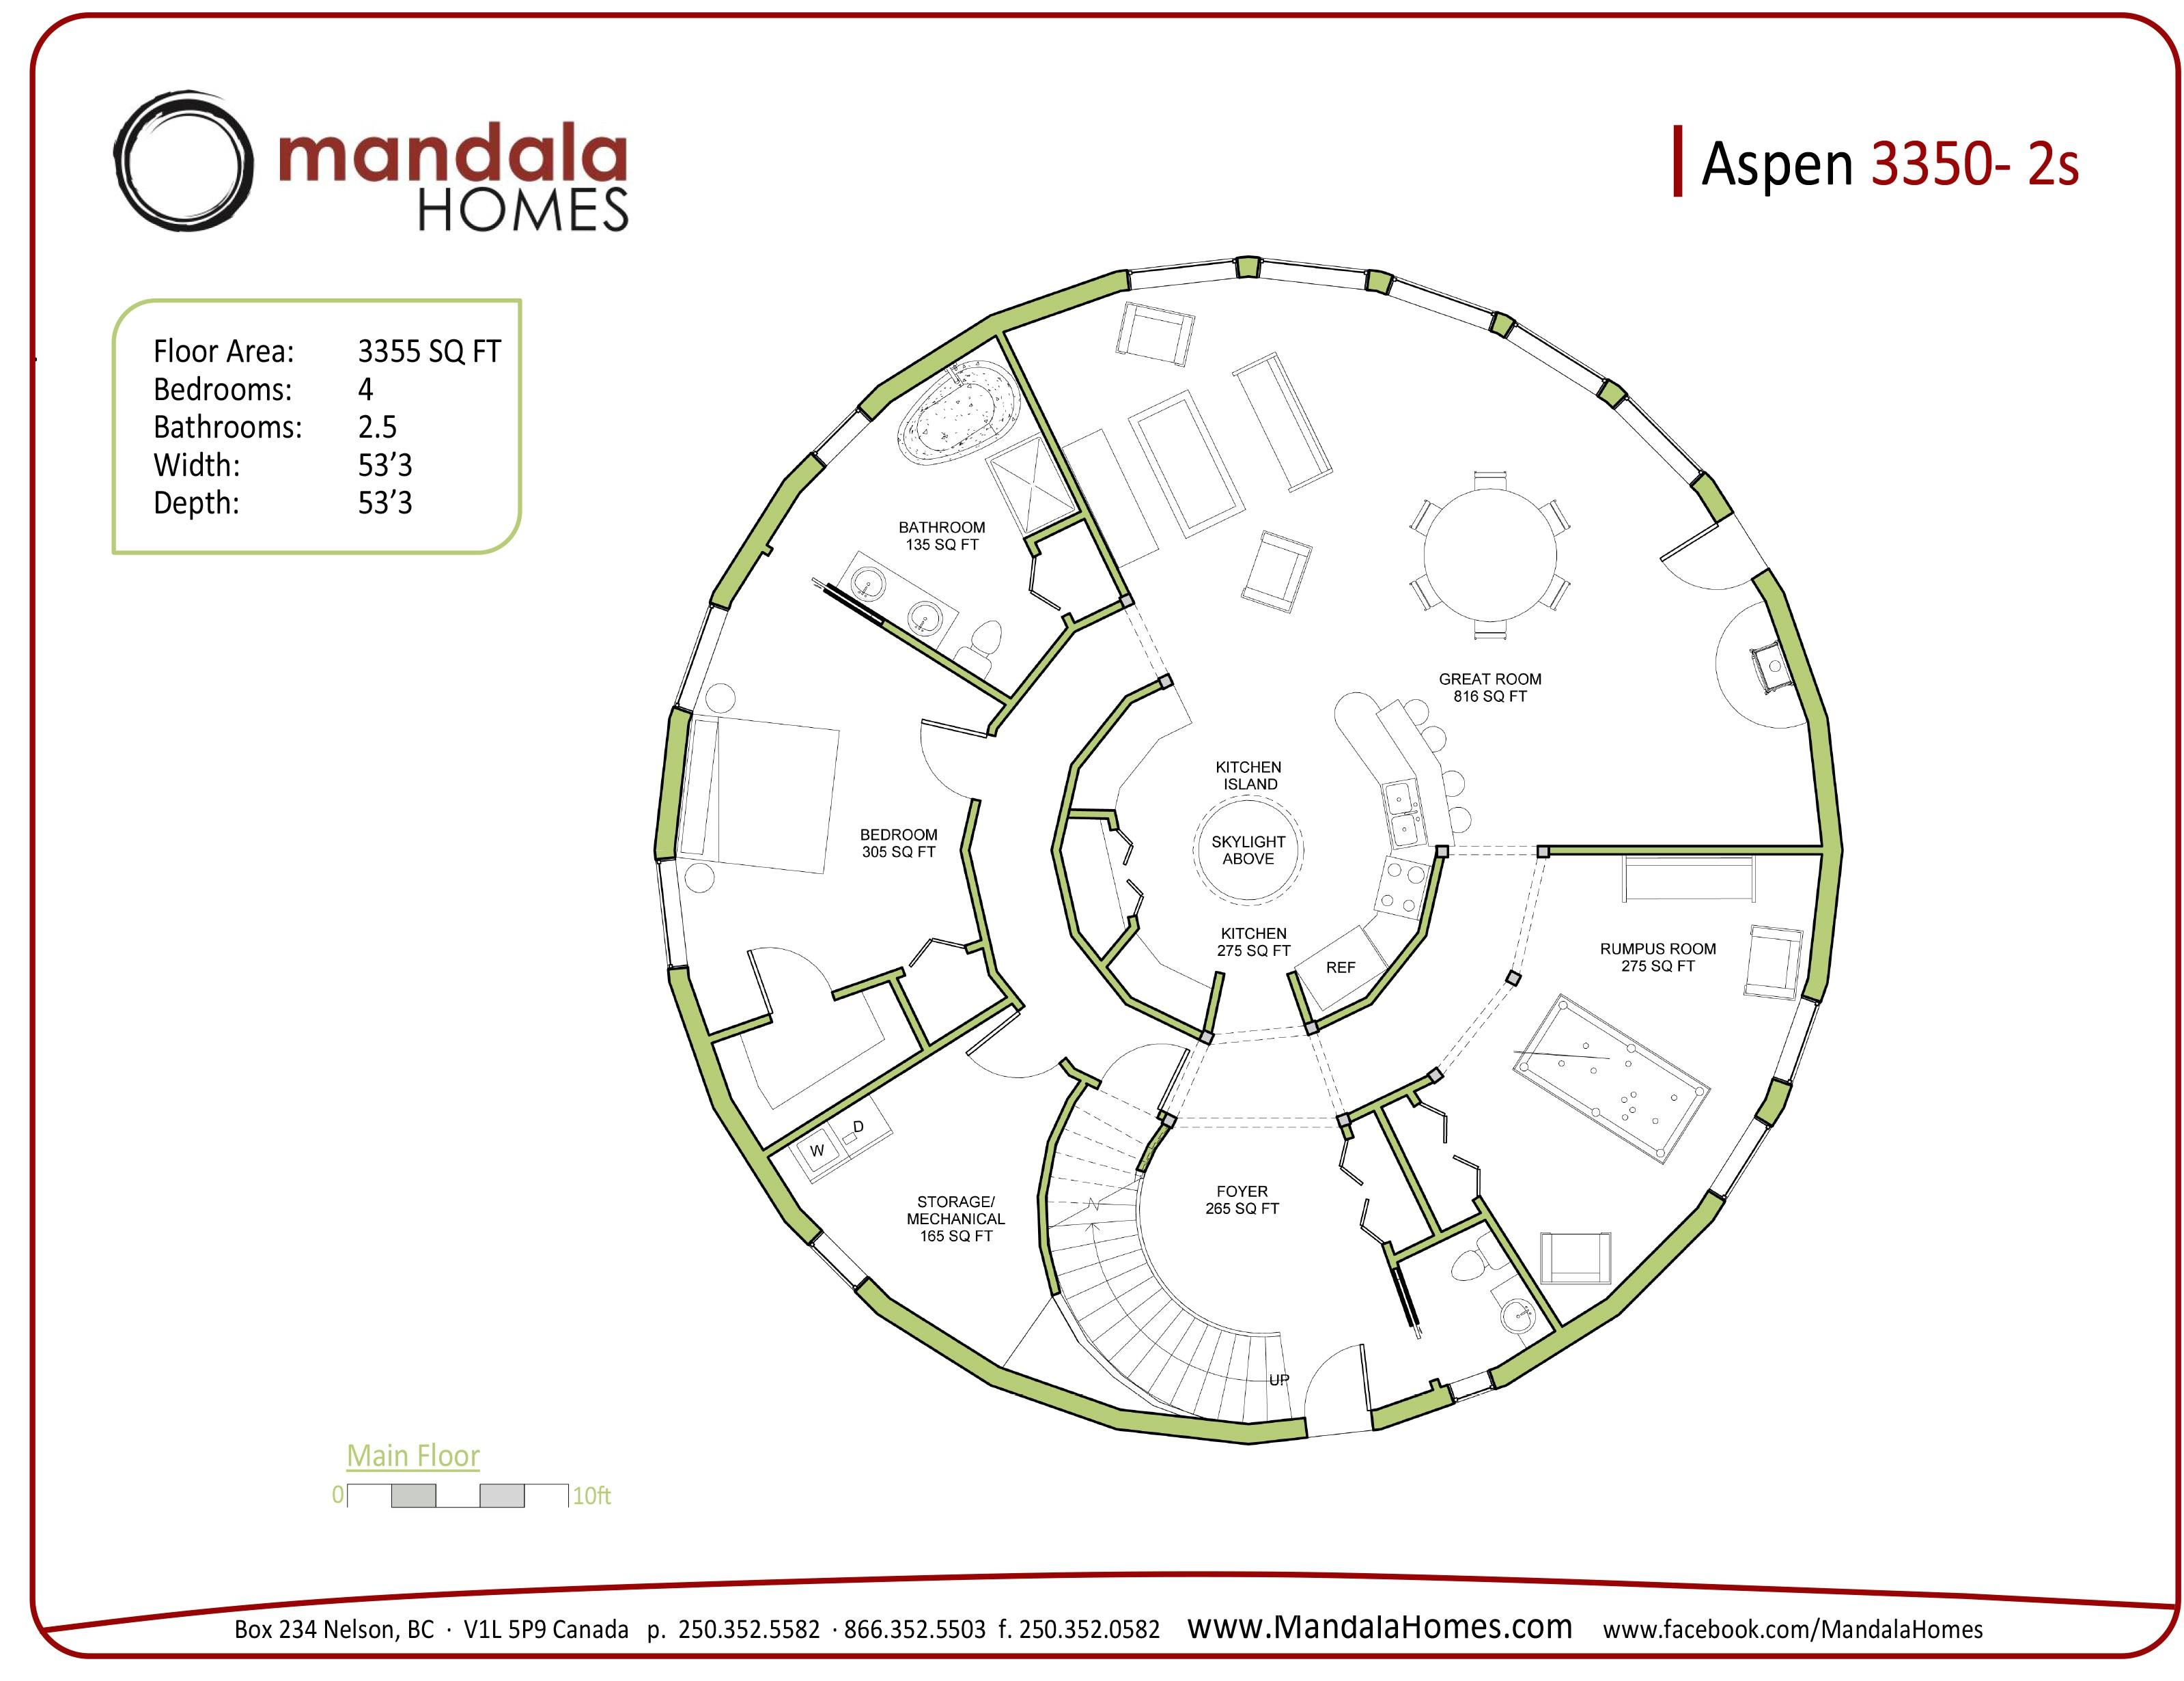 aspen series floor plans mandala homes prefab round 6